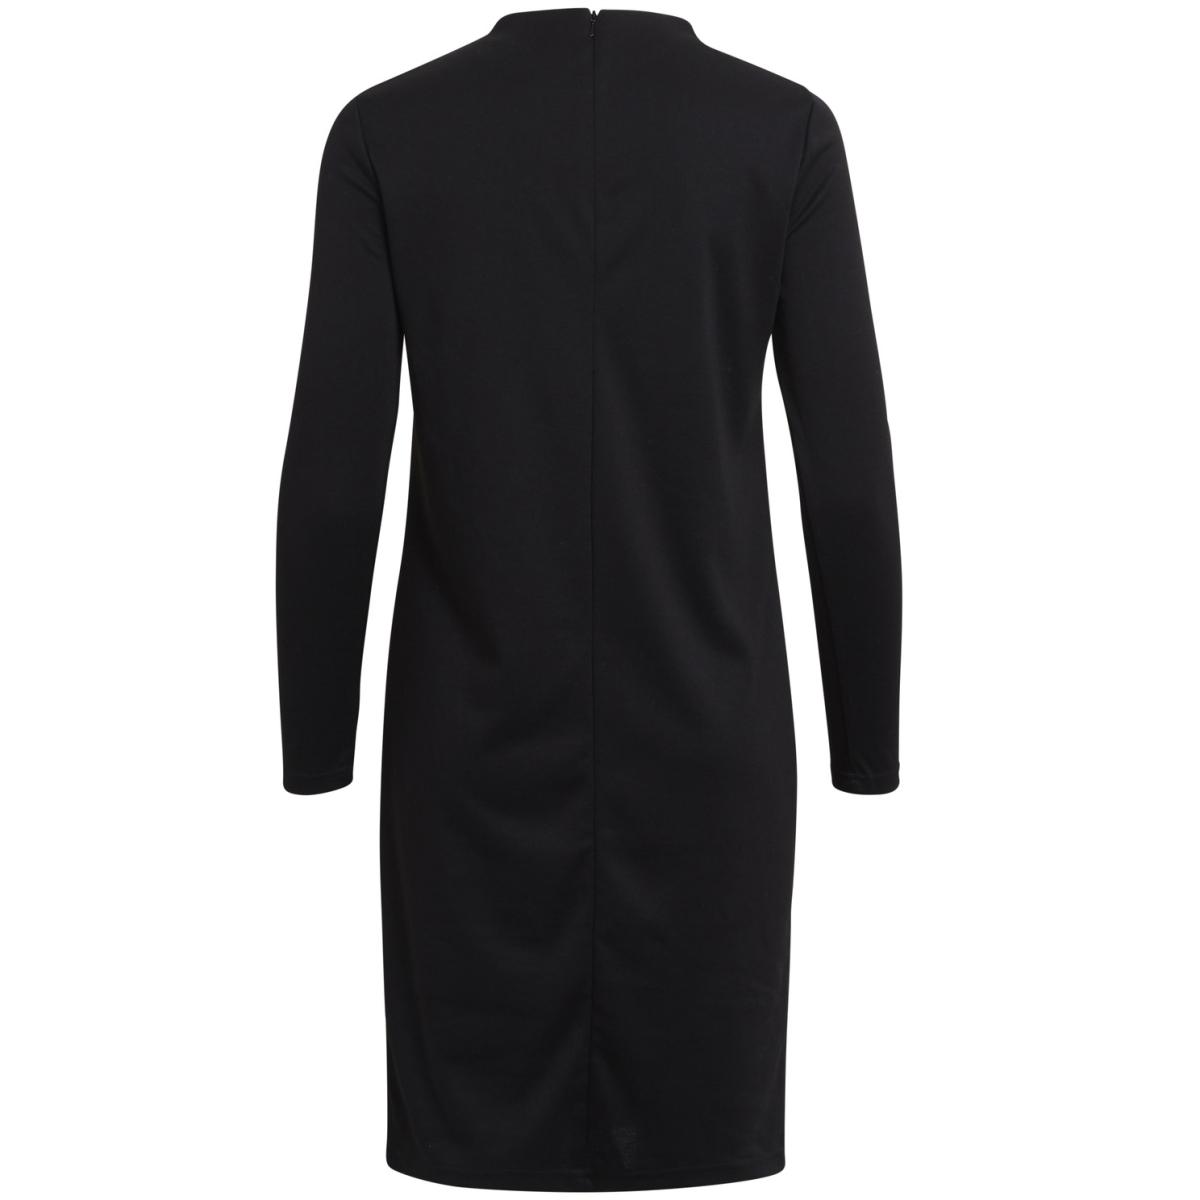 vifaunas l/s high neck dress-noos 14042374 vila jurk black